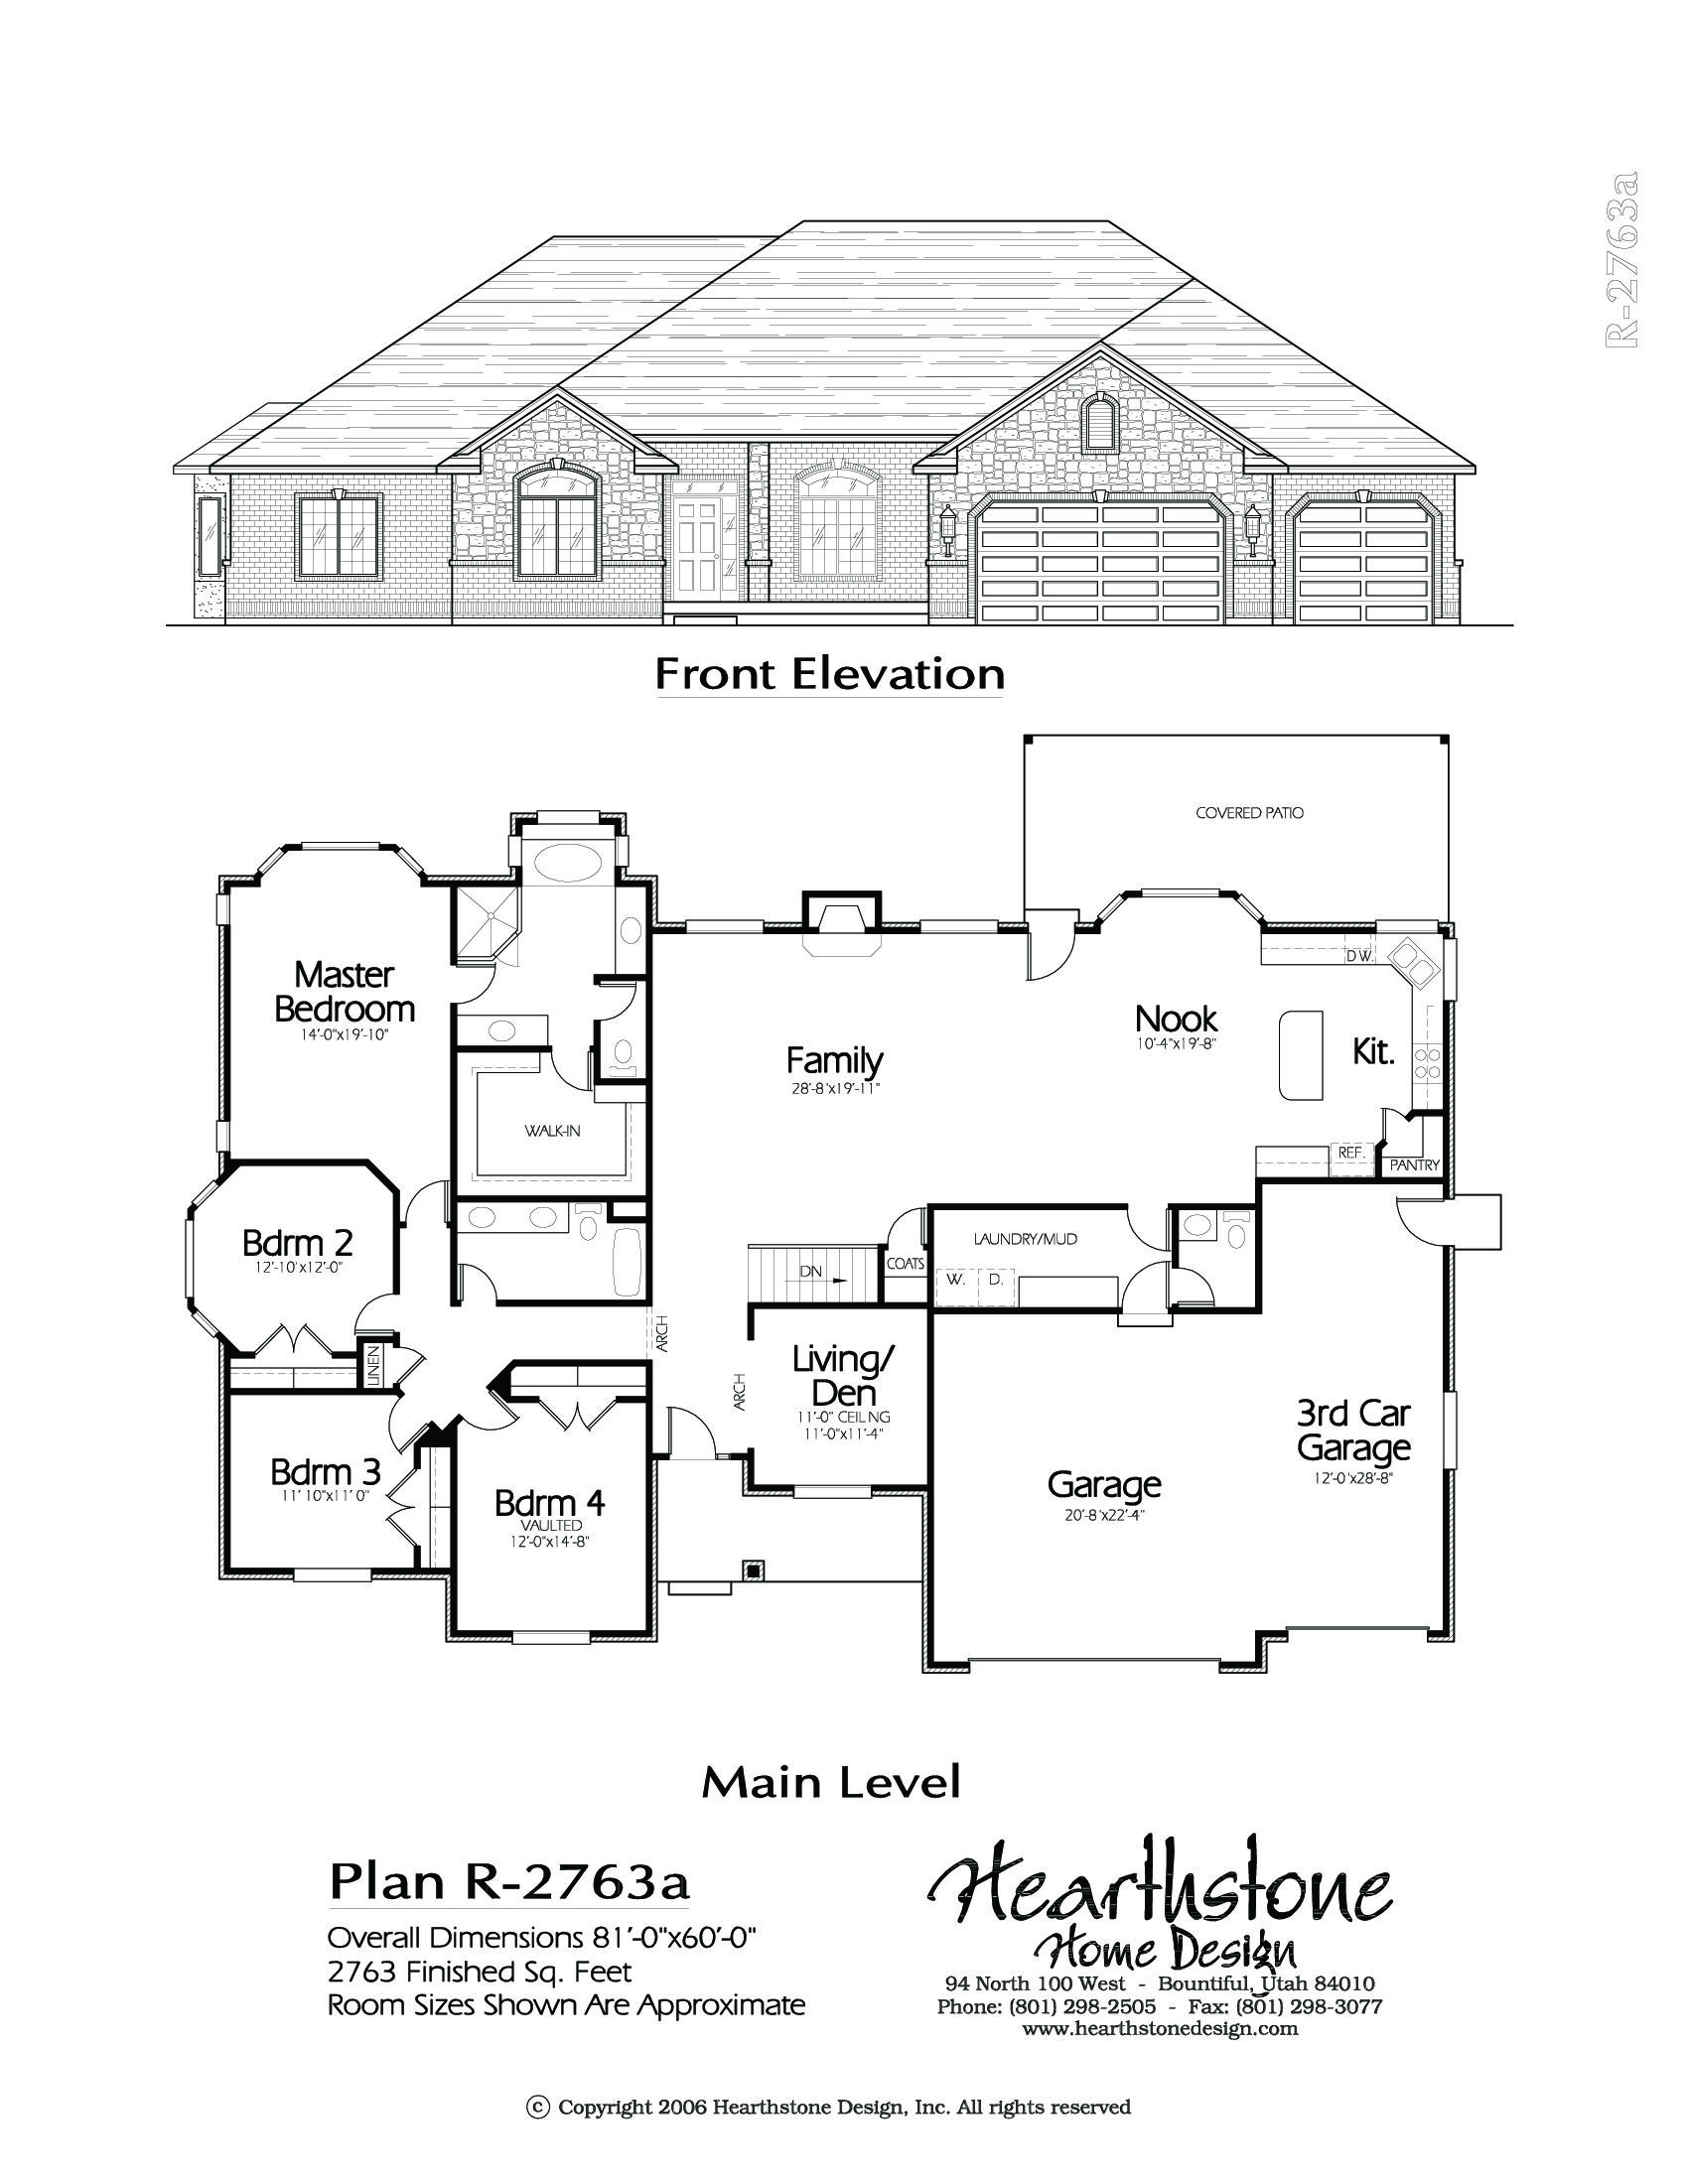 R 2763a Hearthstone Home Design Architectural House Plans House Plans Garage Plans